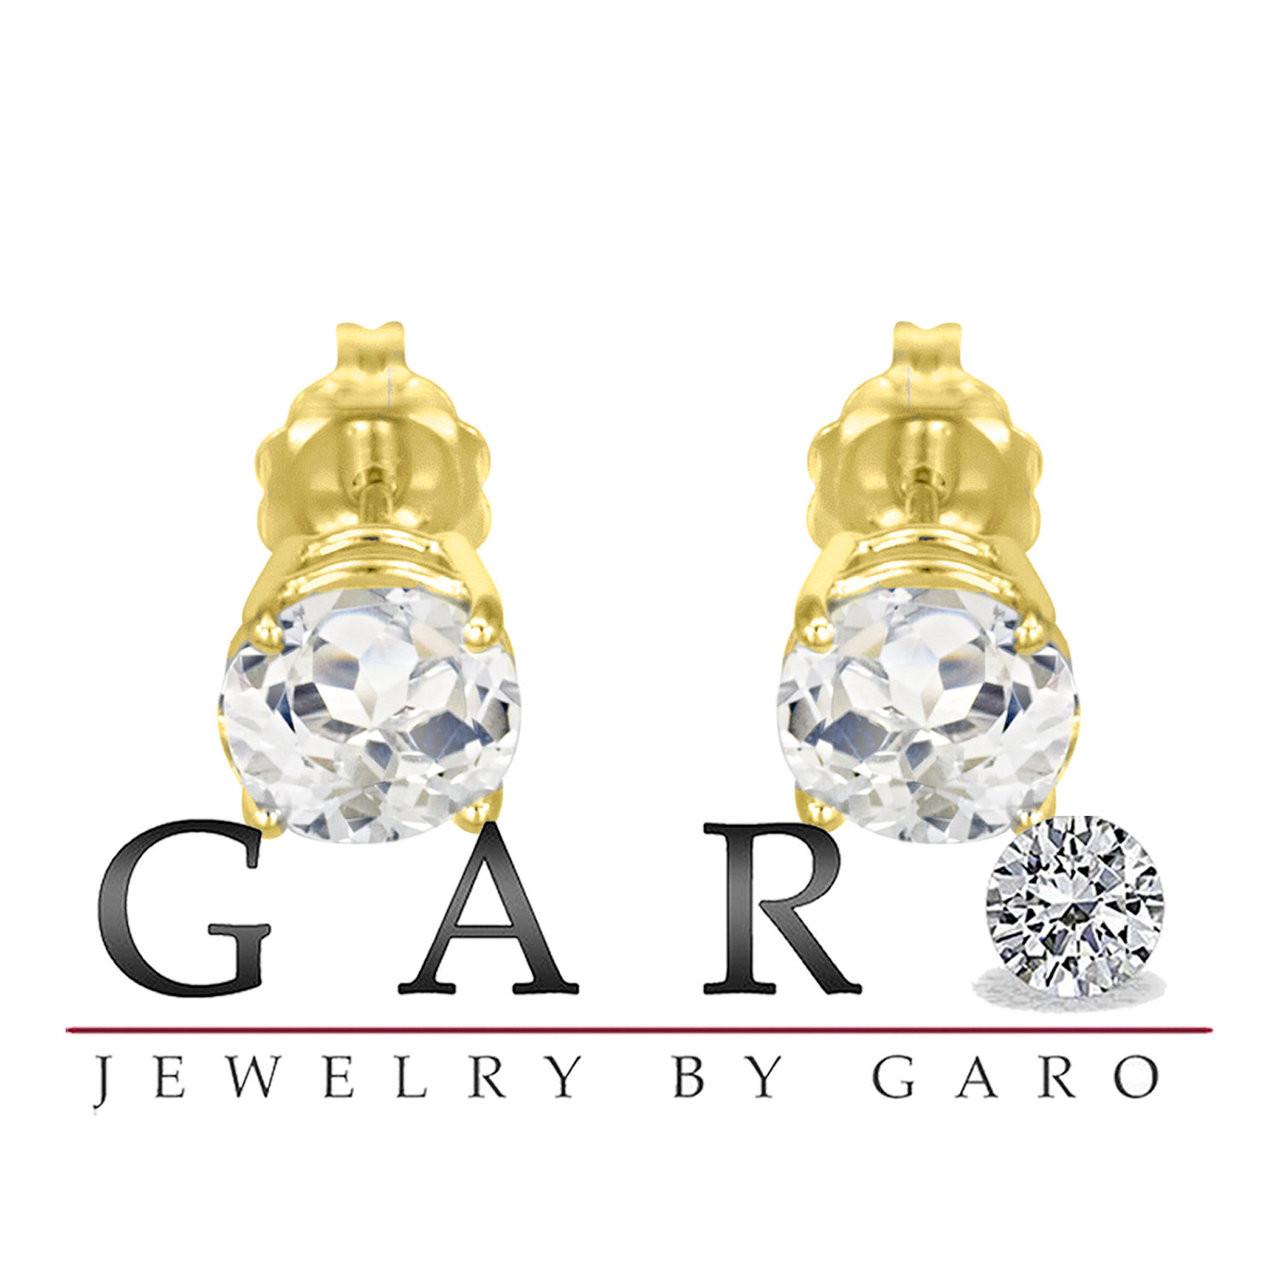 927b0ce68 Yellow Gold White Topaz Stud VVS1 14K Earrings 2.00 Carat HandMade. Larger  / More Photos